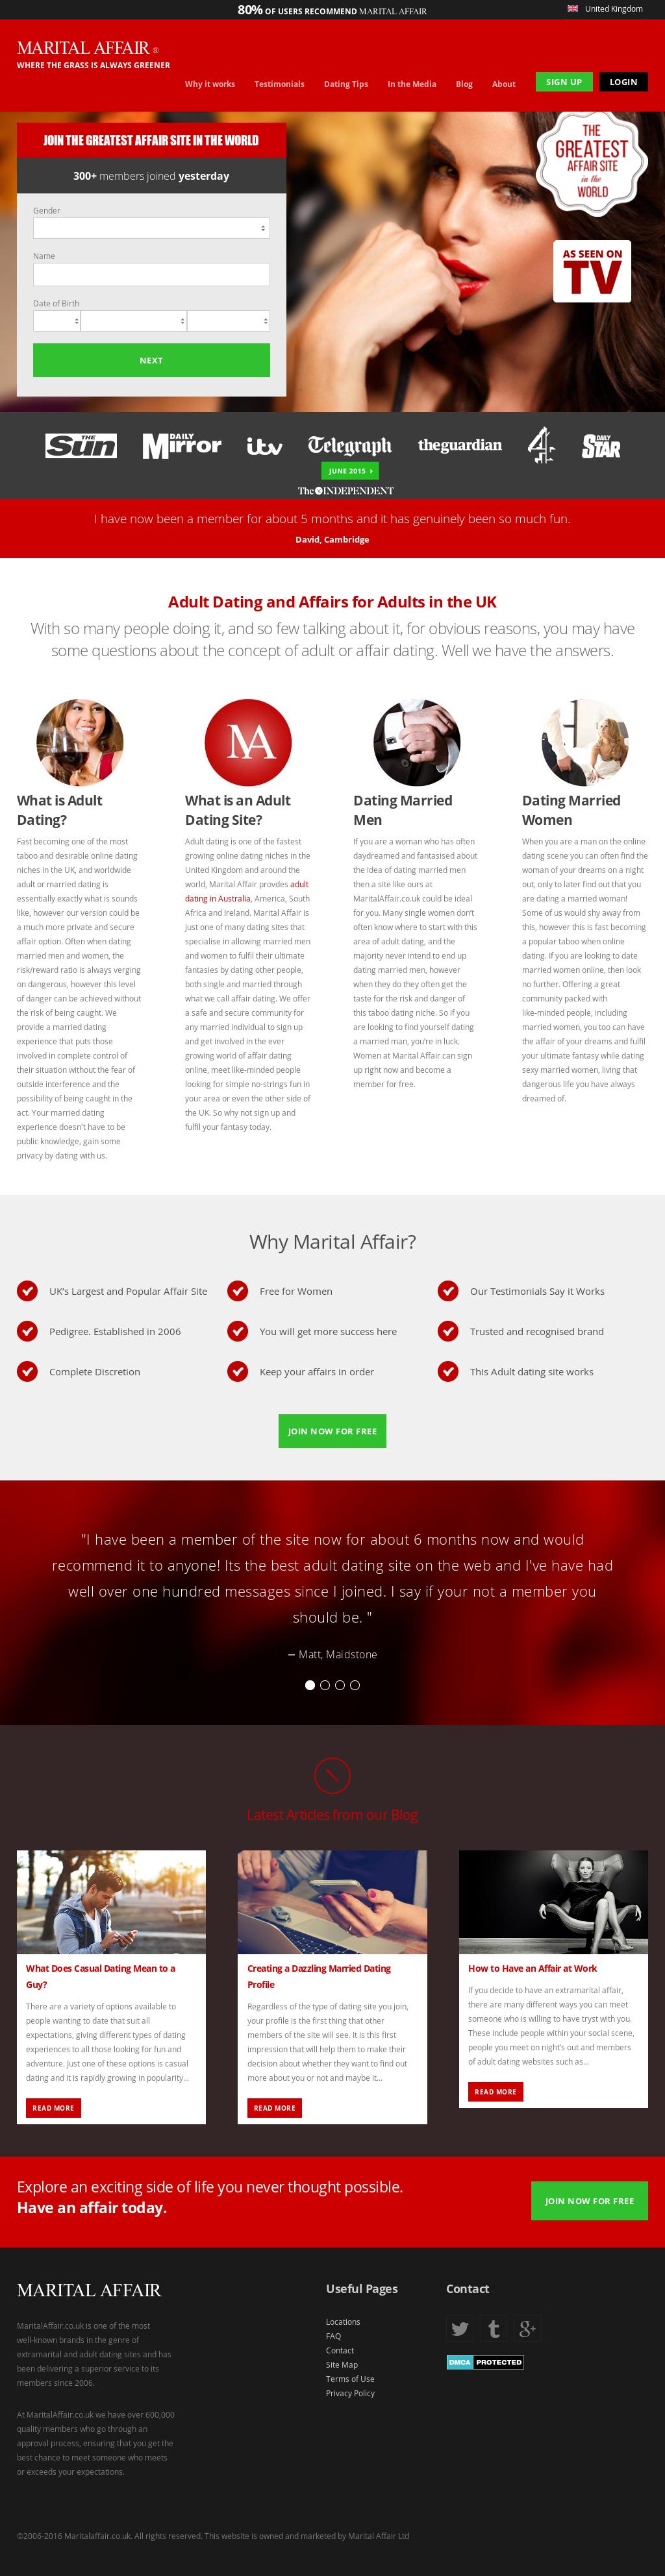 Adult affair website